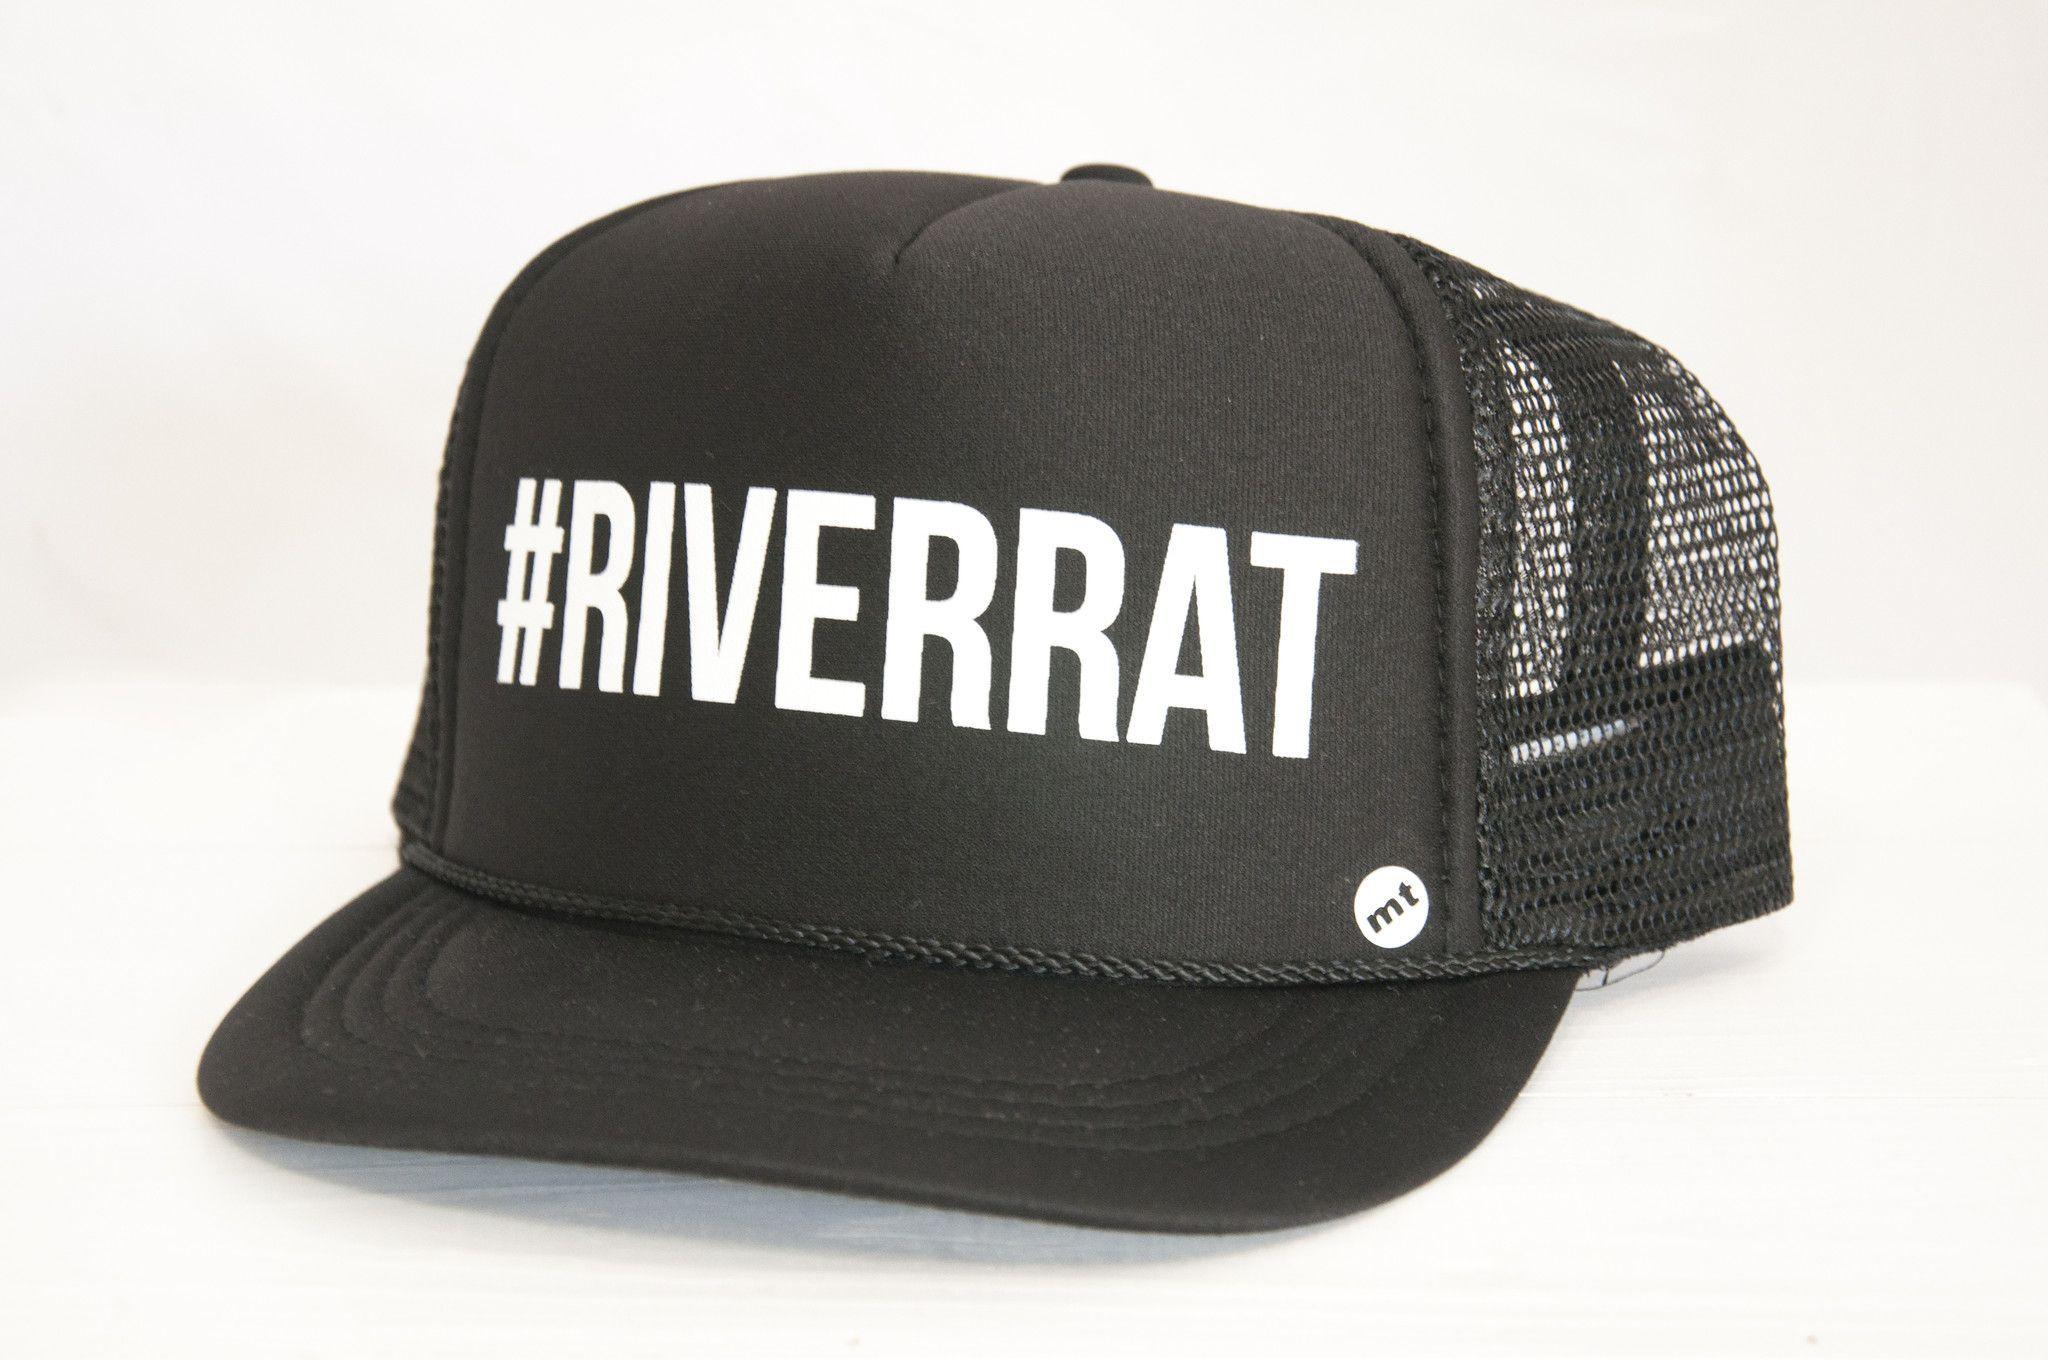 #RIVERRAT- YOUTH